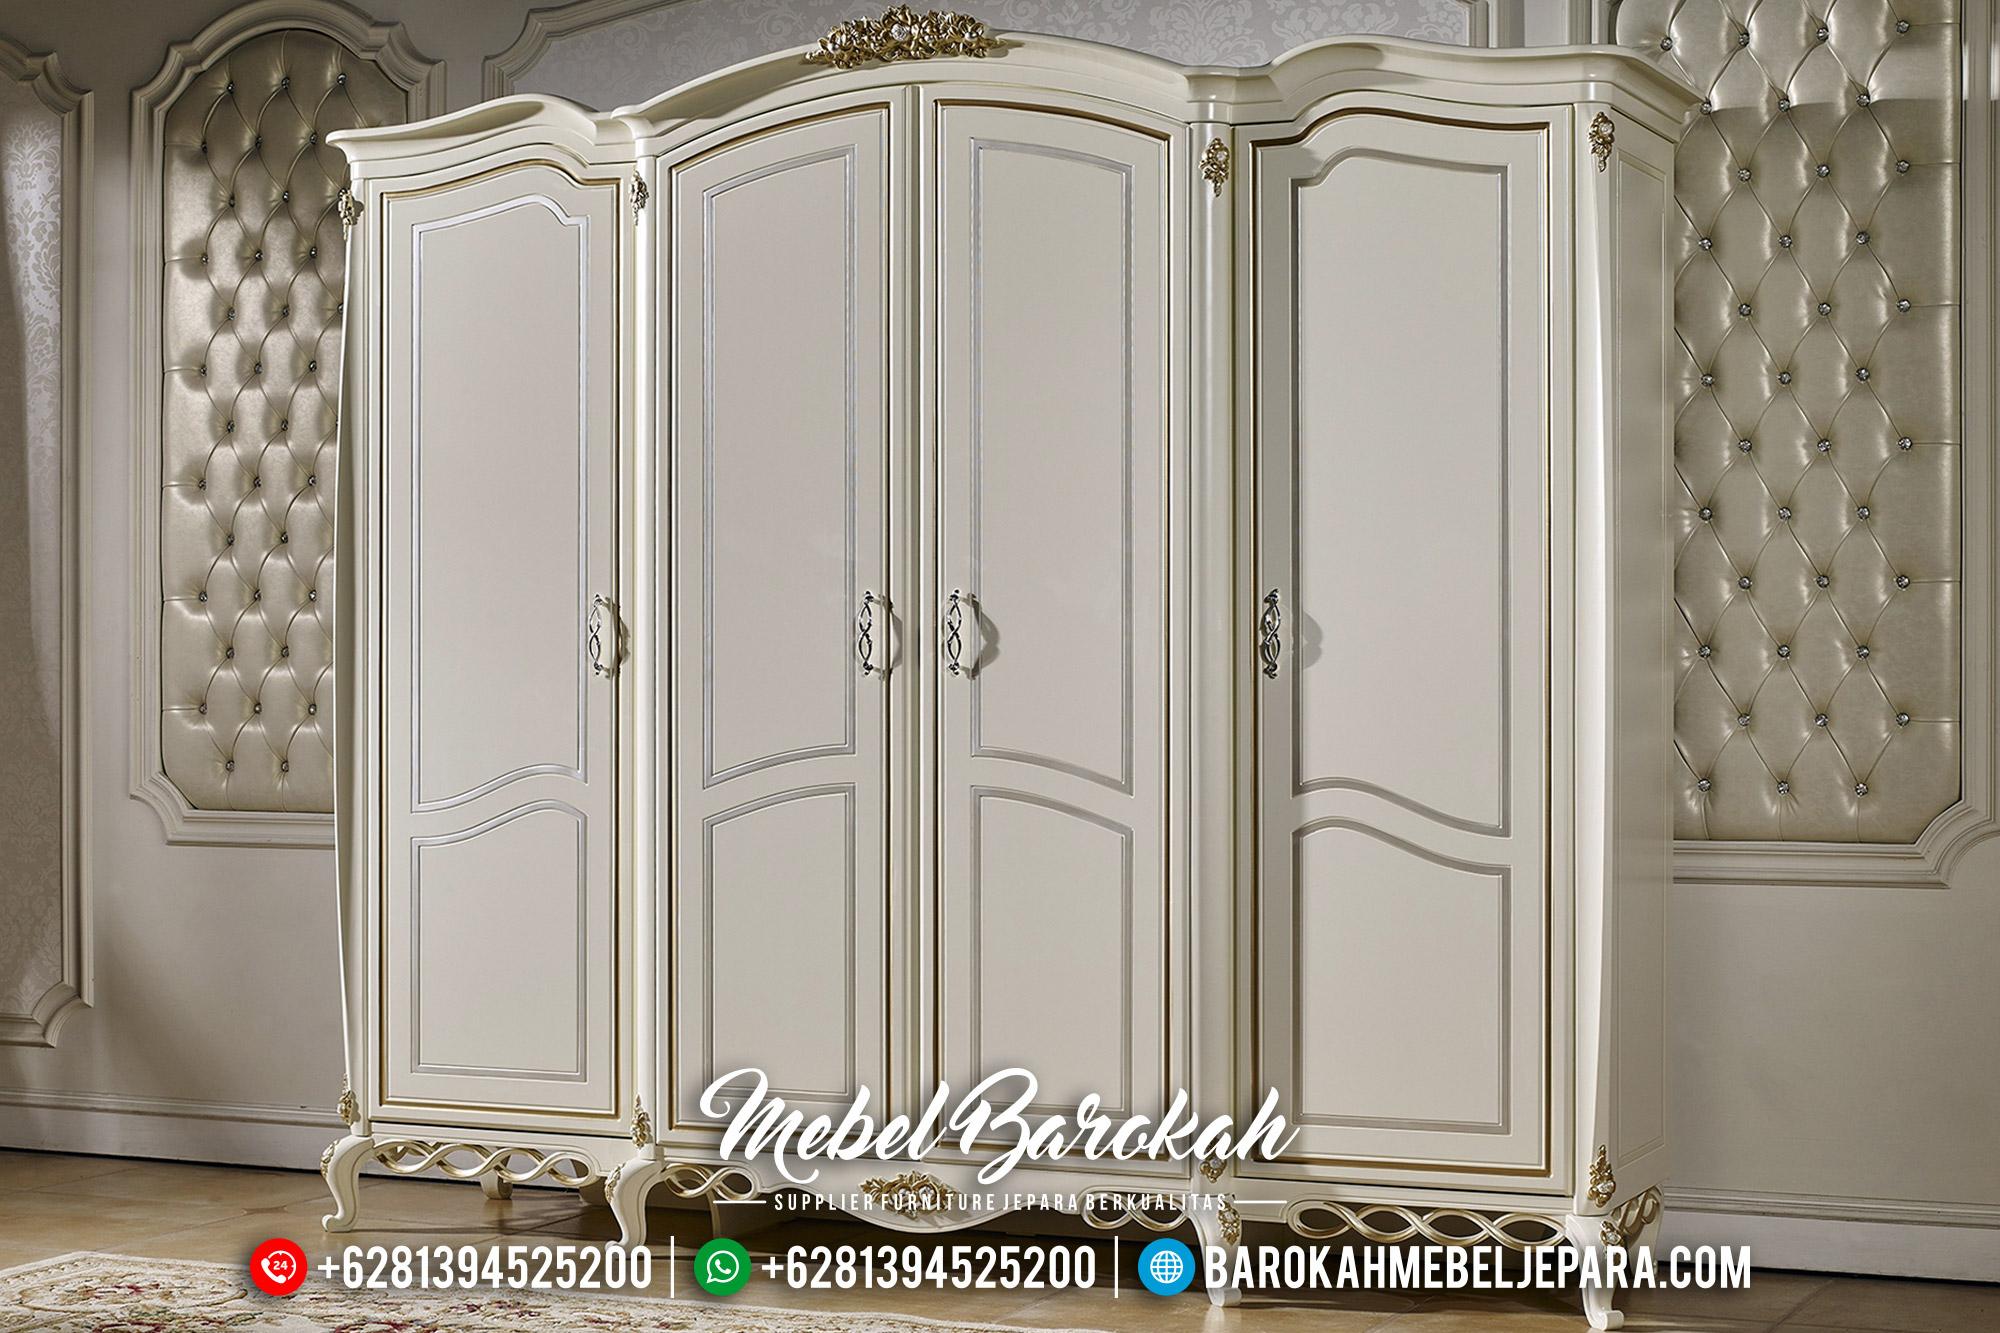 Lemari Pakaian Mewah Desain Kamar Set Luxury Jepara MB-0500